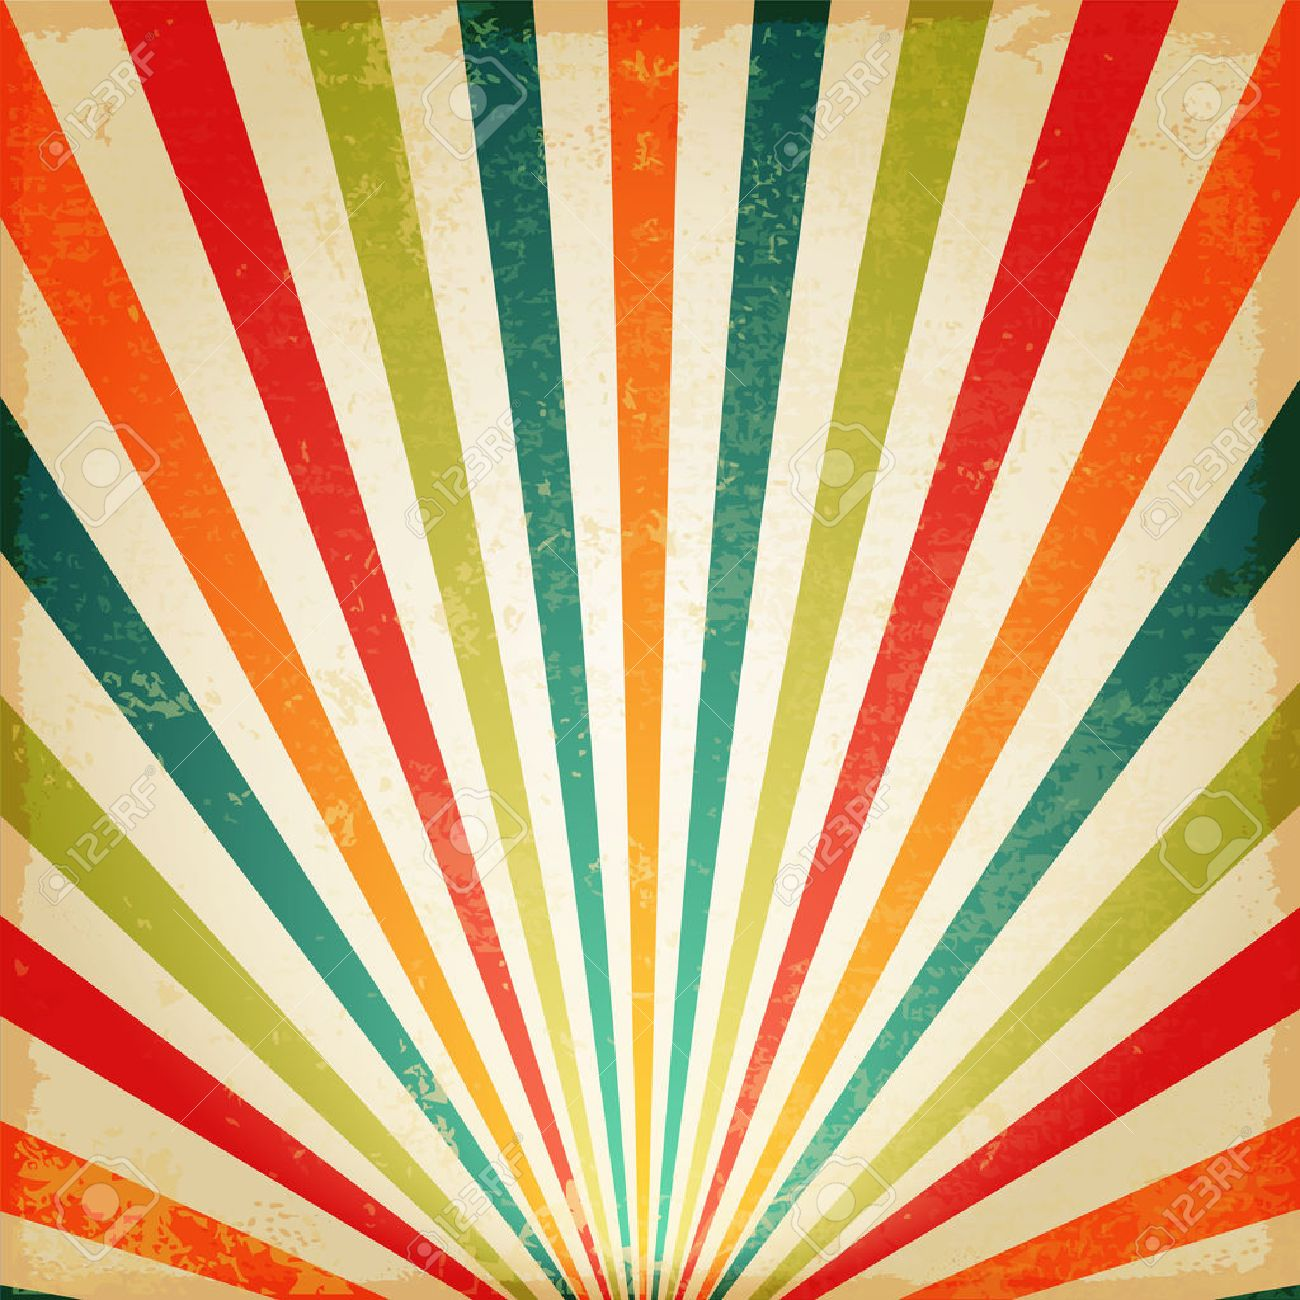 new vintage multicolor rising sun or sun raysun burst retro background design stock vector